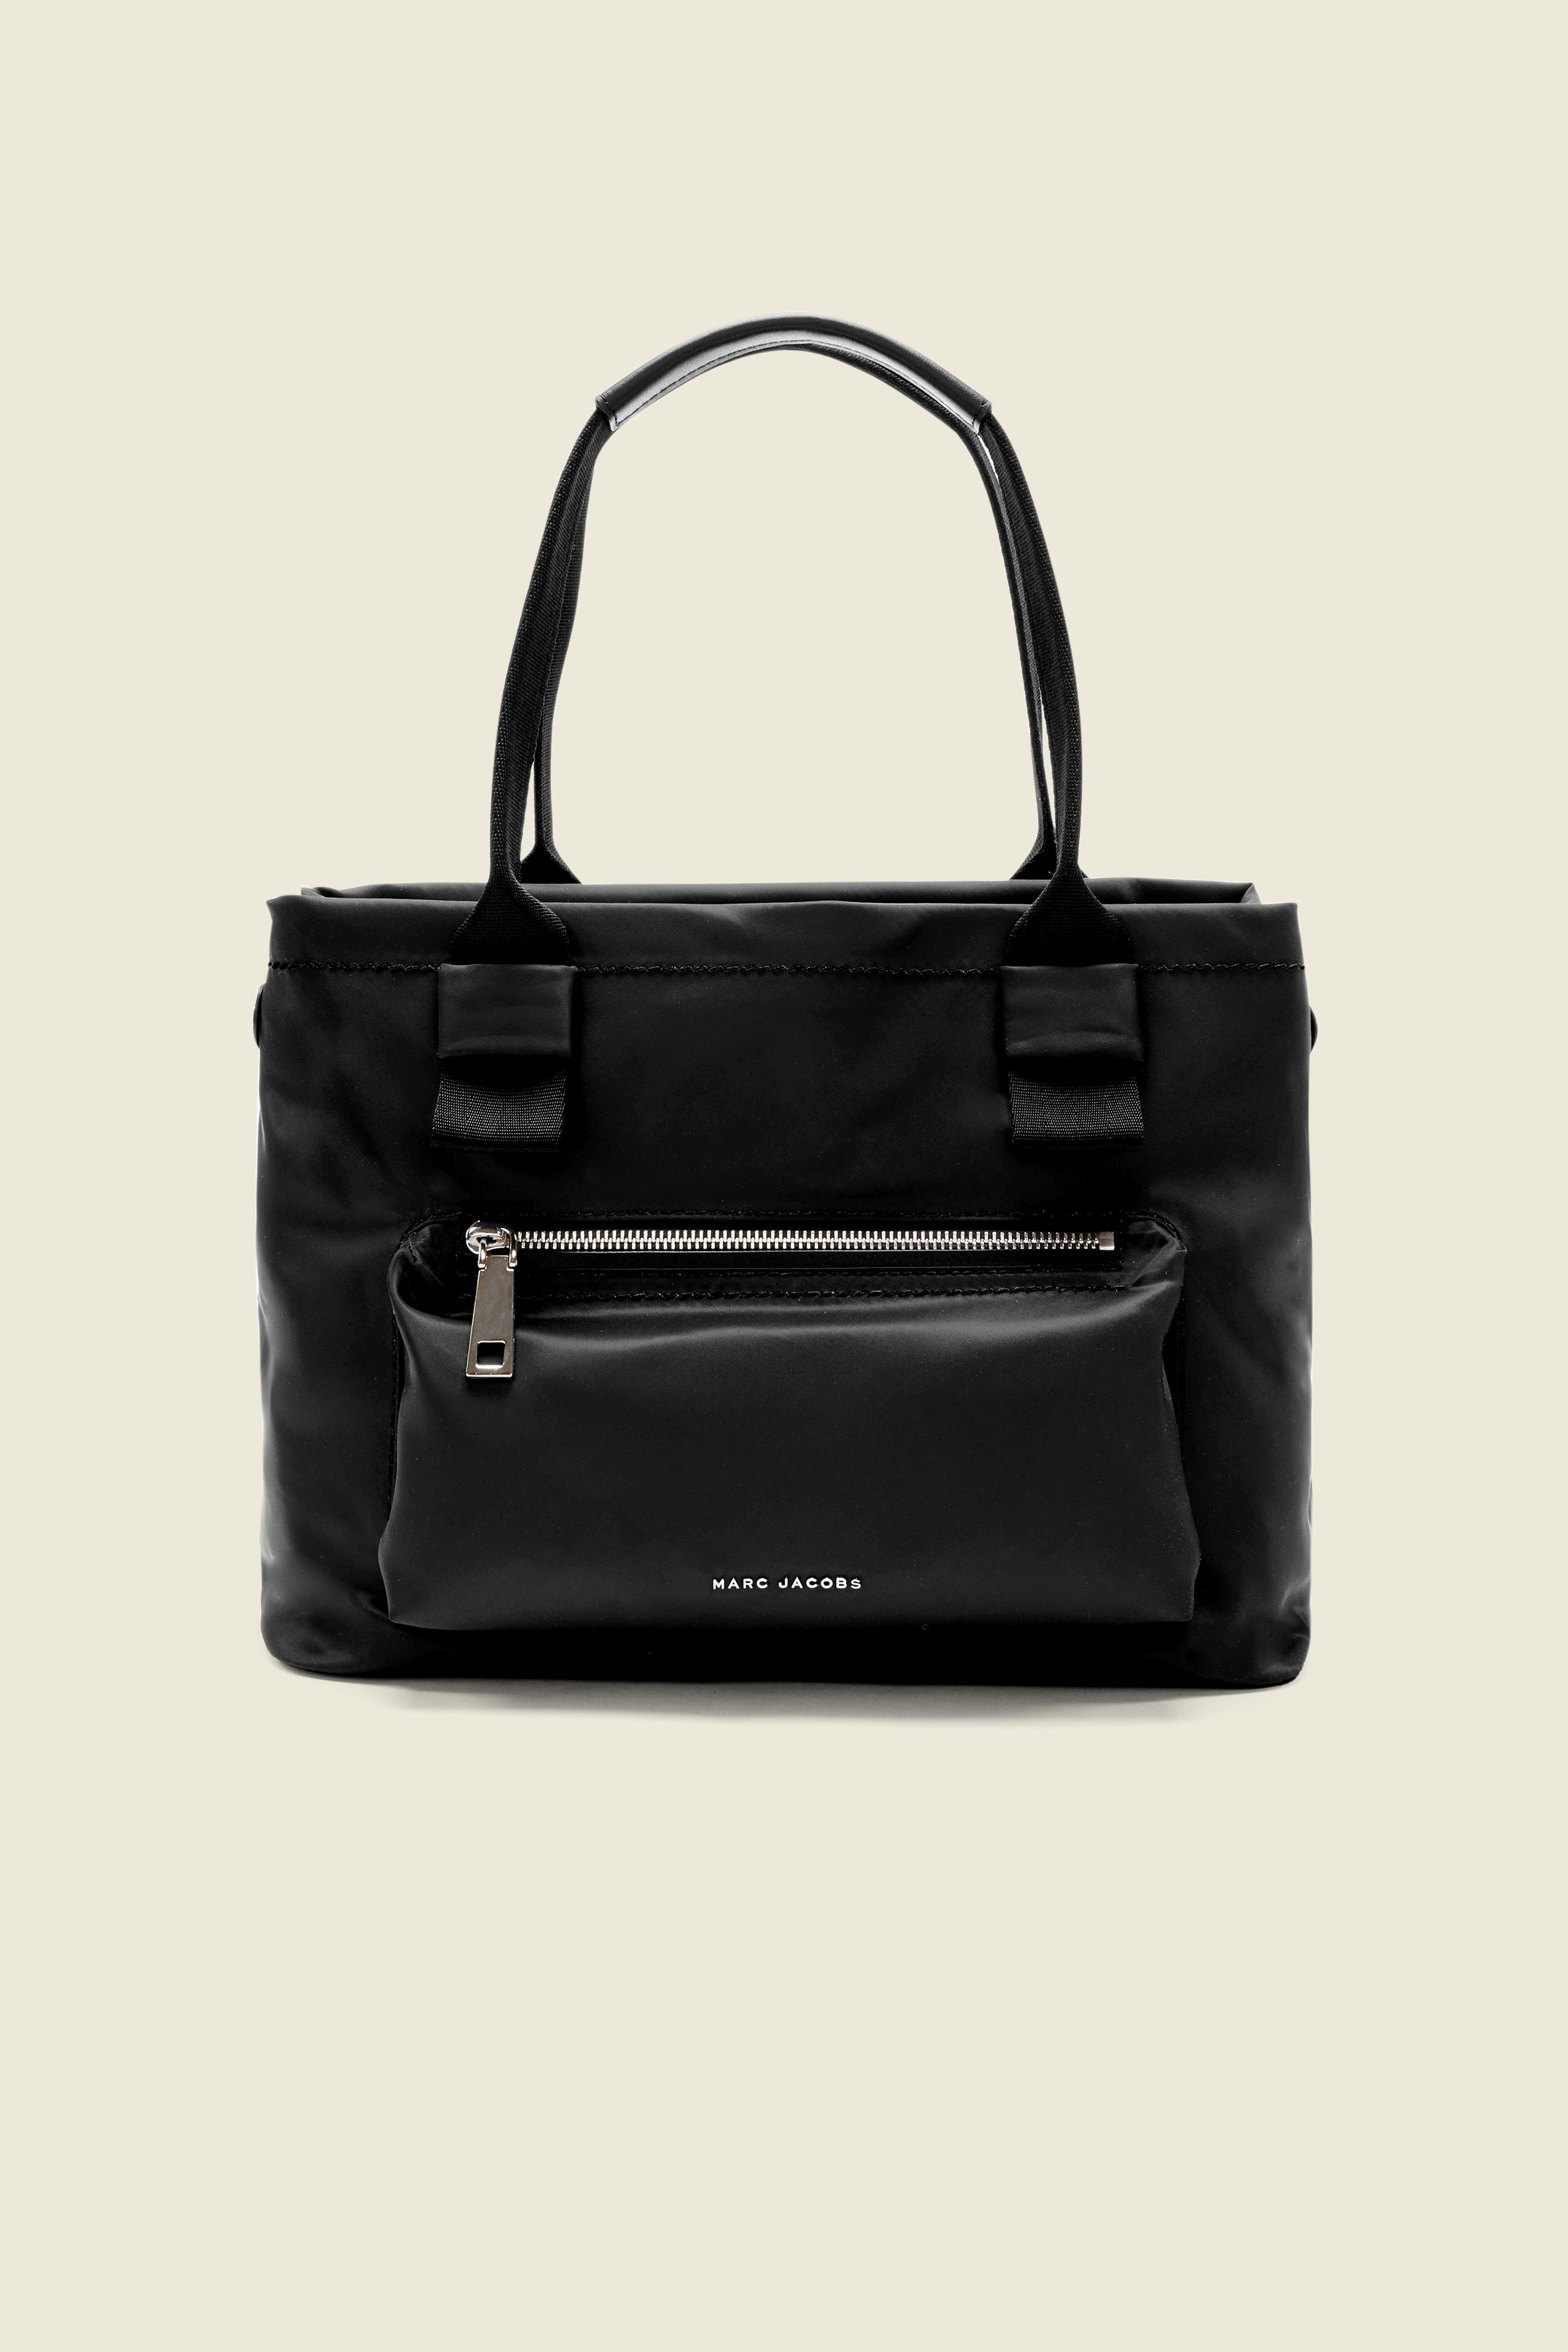 Marc Jacobs Easy Tote Bag In Black